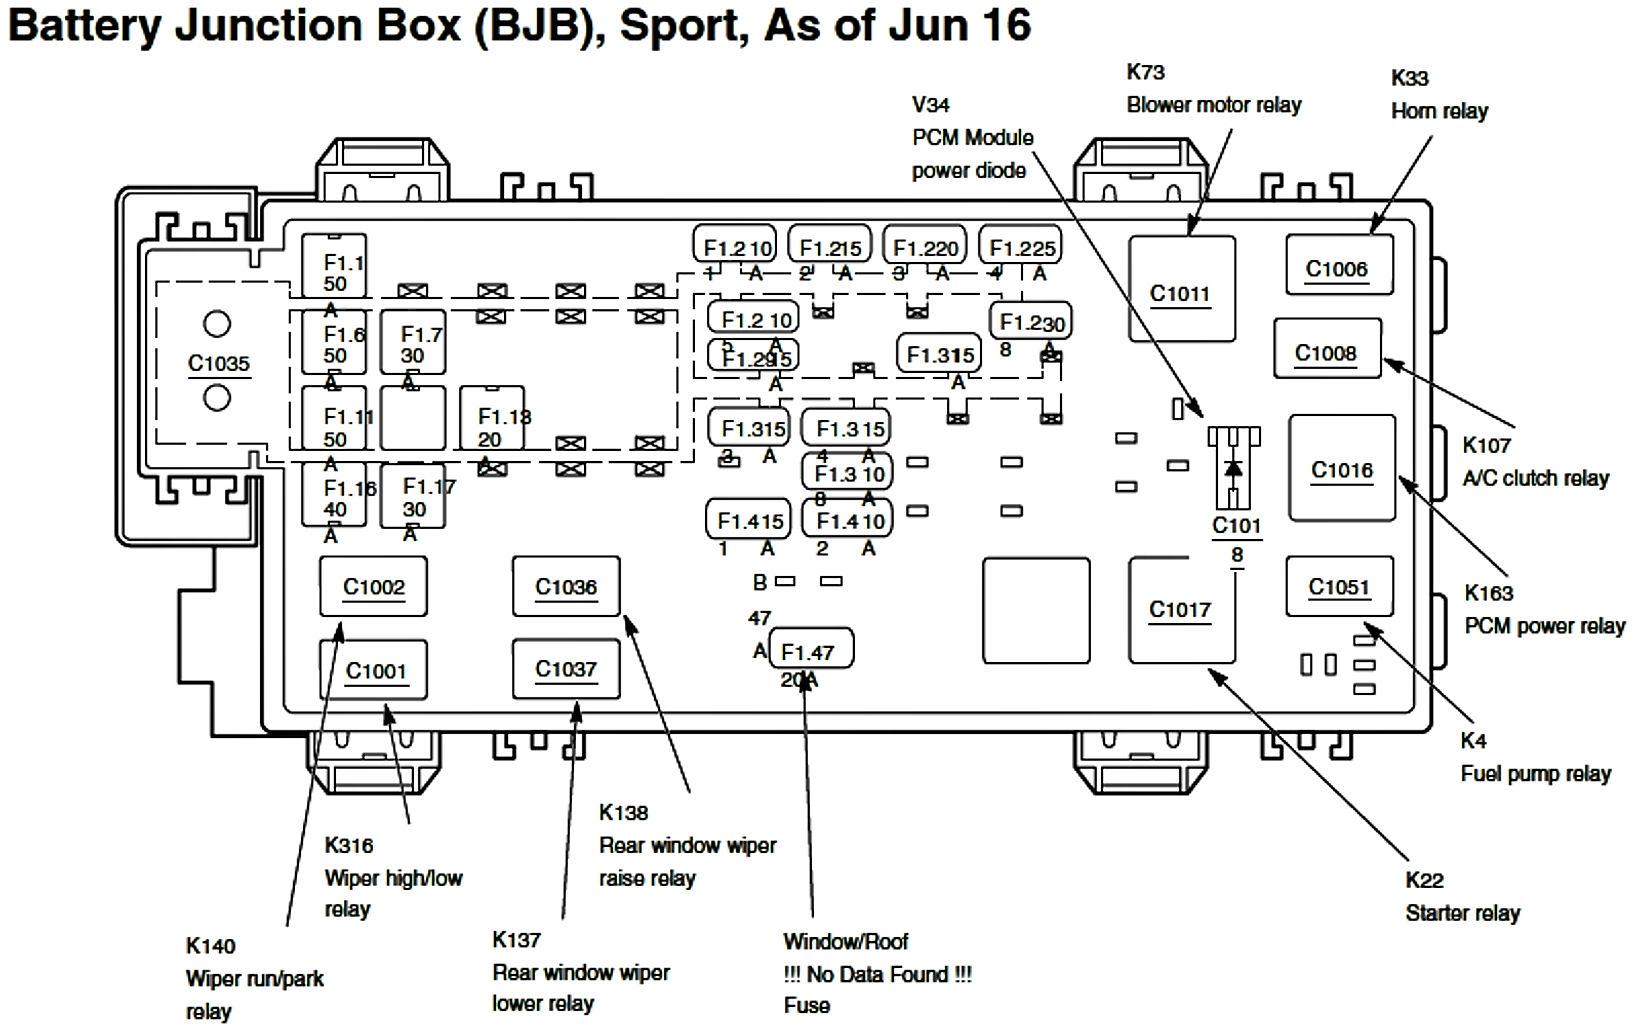 fuse diagram for 2004 explorer 2001 explorer sport fuse diagram wiring diagram data  2001 explorer sport fuse diagram